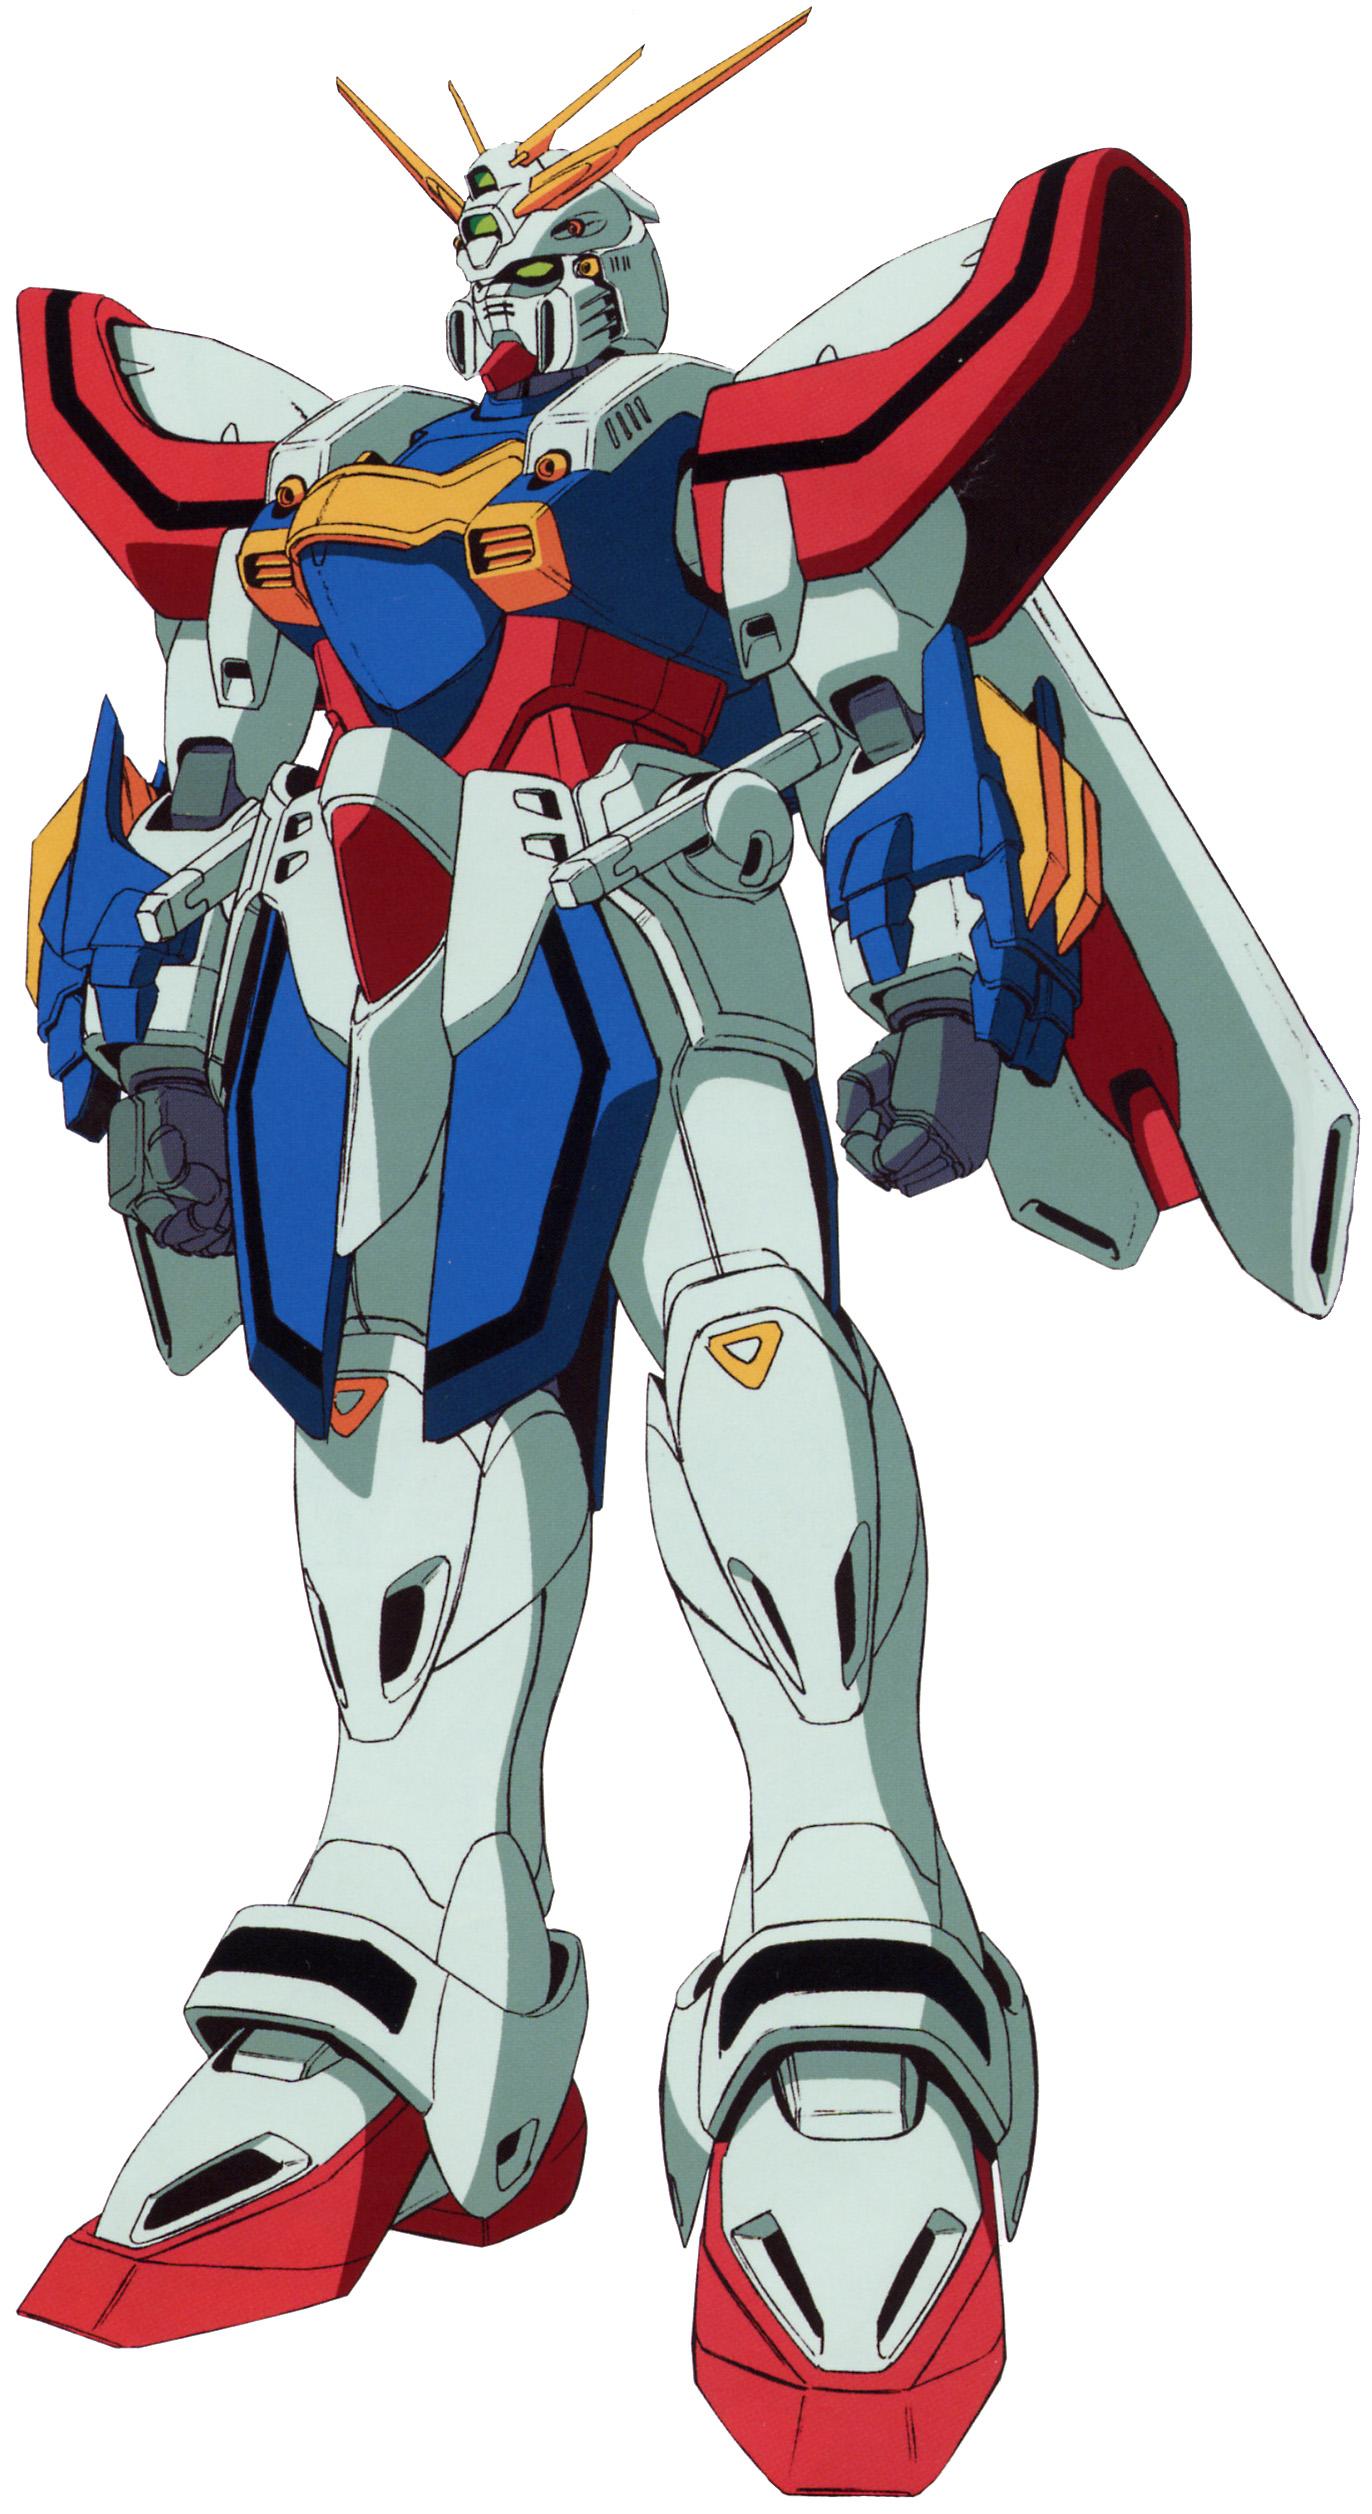 15+ Shining Gundam Ost You Never Seen Before 11